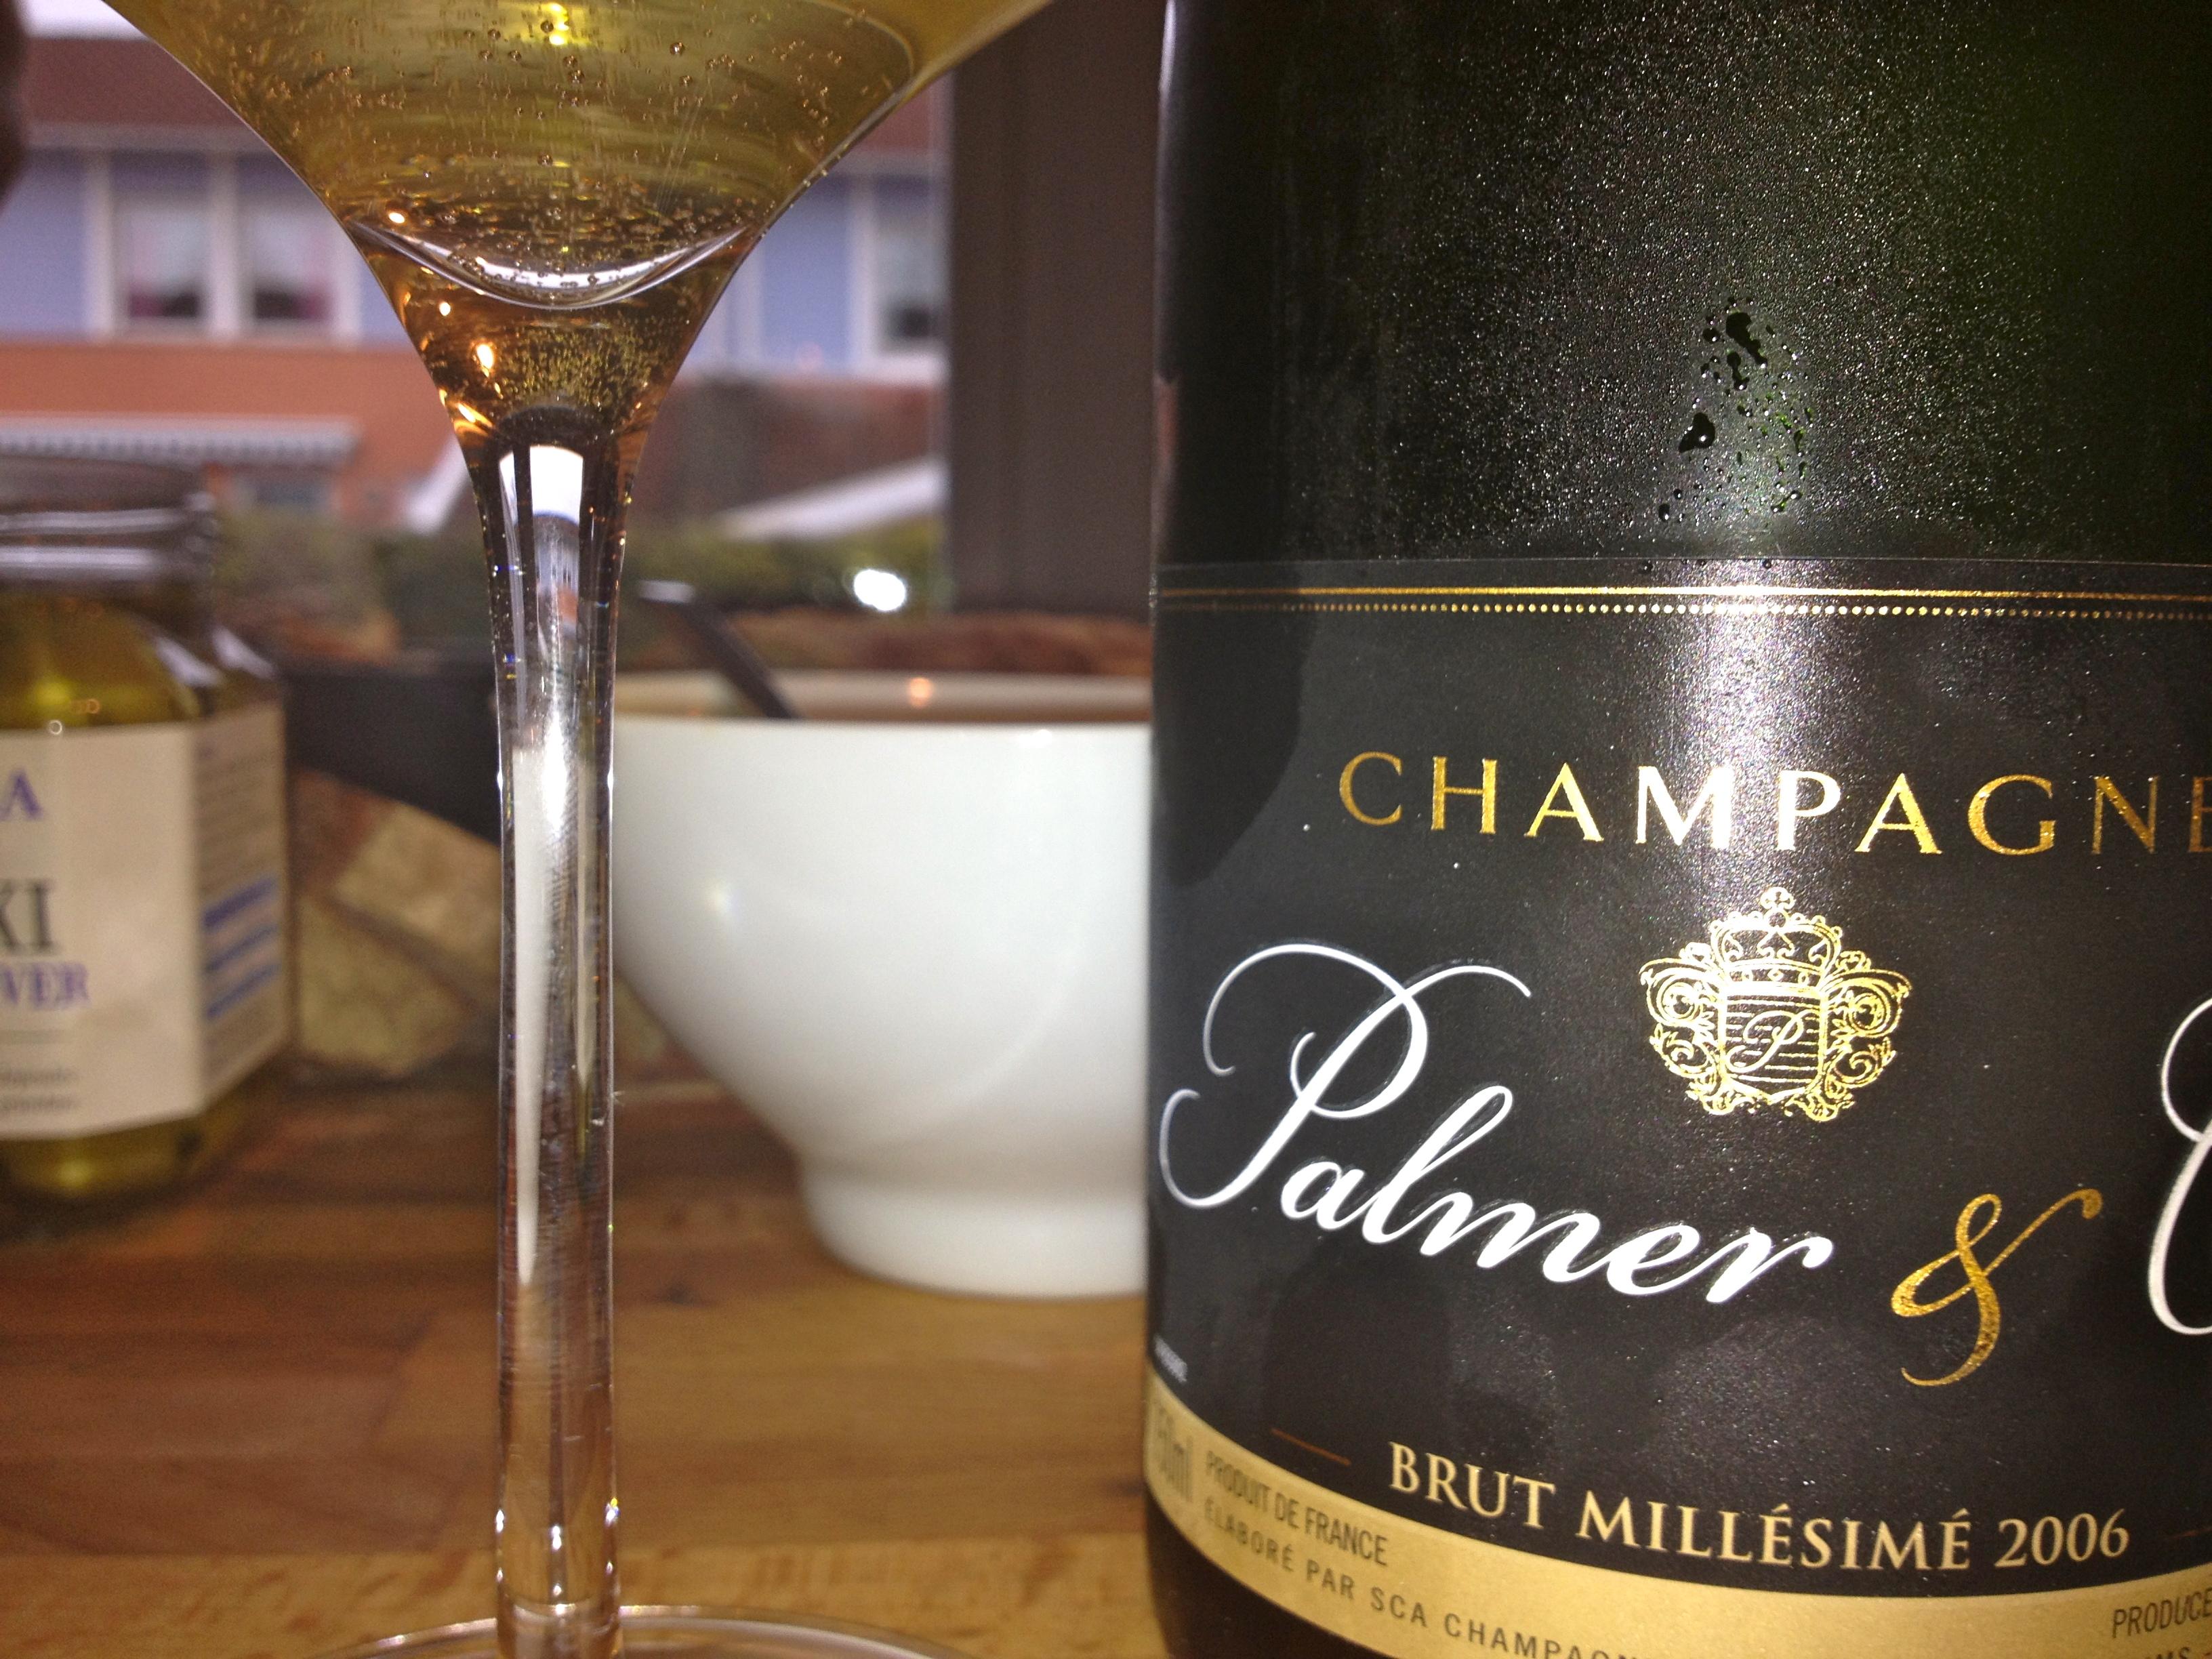 Palmer & Co 2006